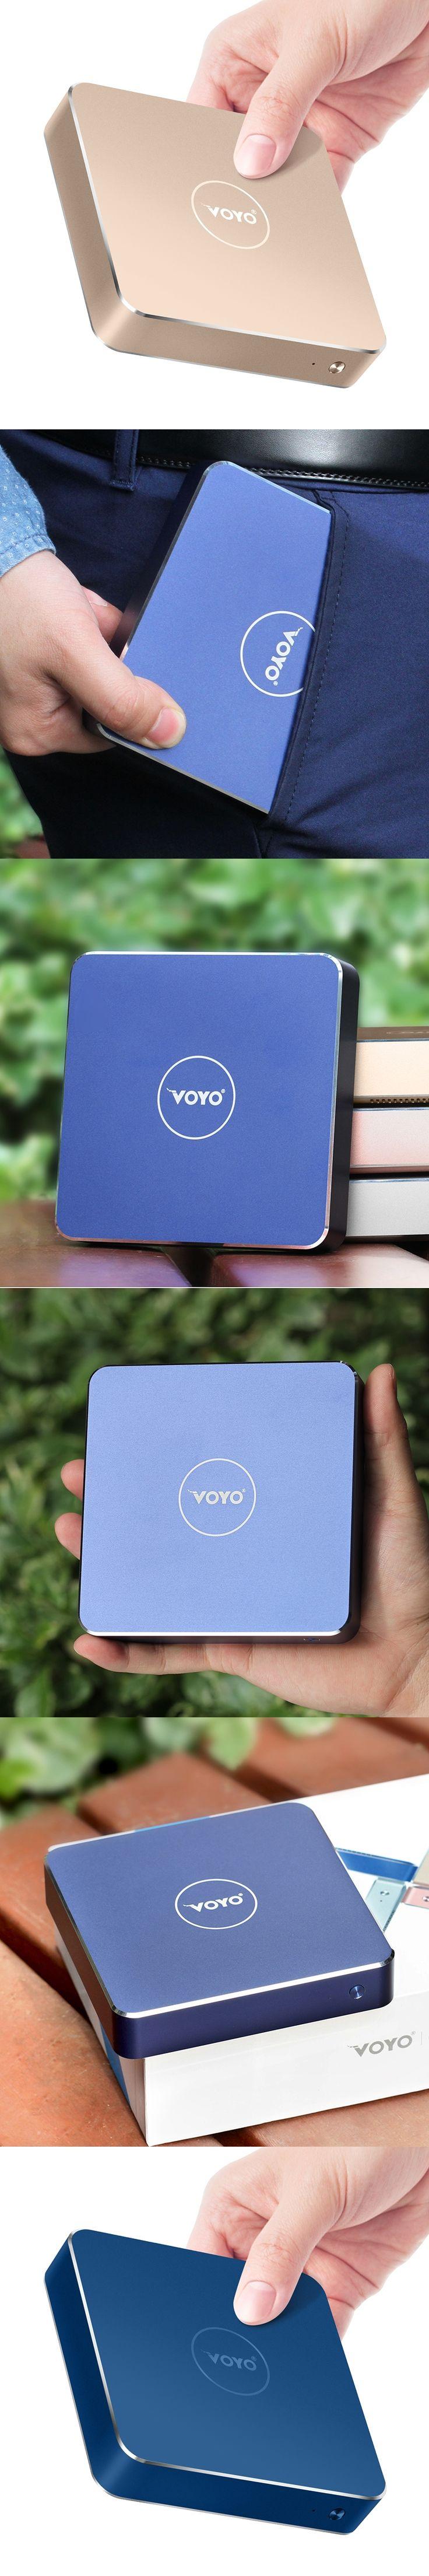 New VOYO VMac mini pcs V1 Intel Apollo N3450 License Windows 10 Pocket PC4GB DDR3L RAM+64GB SSD mini pc desktop computer office